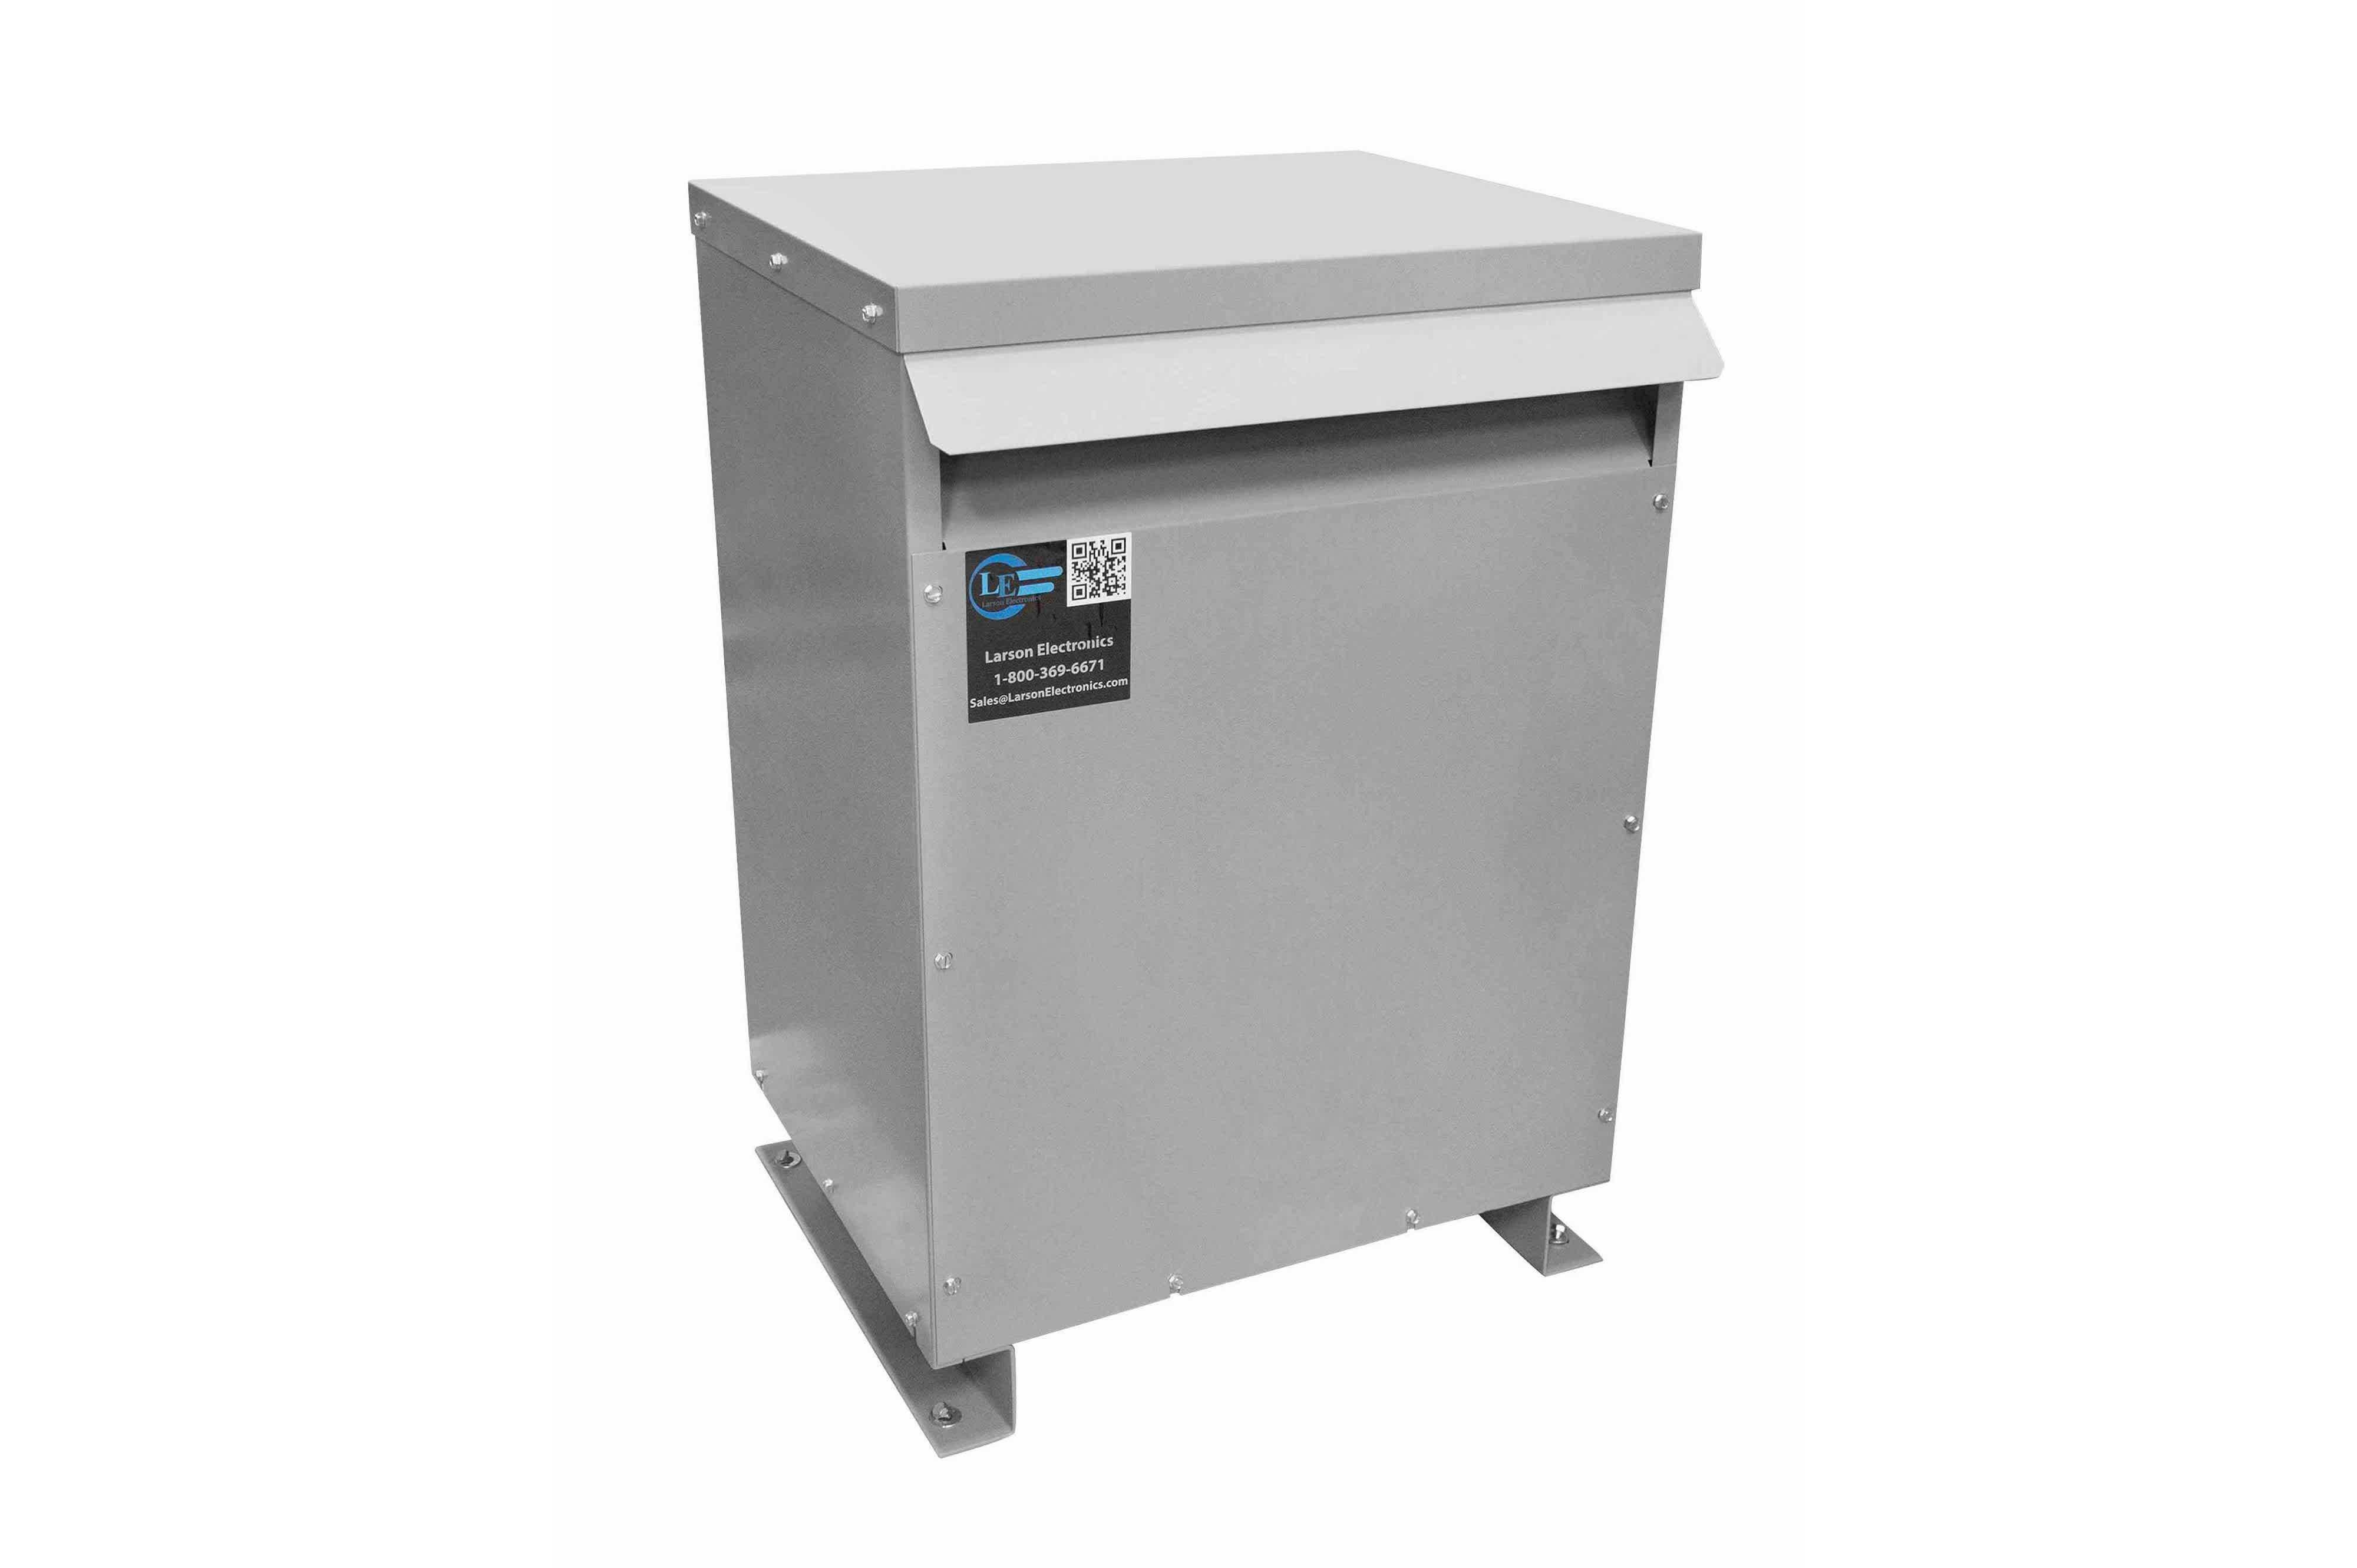 250 kVA 3PH Isolation Transformer, 460V Wye Primary, 415Y/240 Wye-N Secondary, N3R, Ventilated, 60 Hz